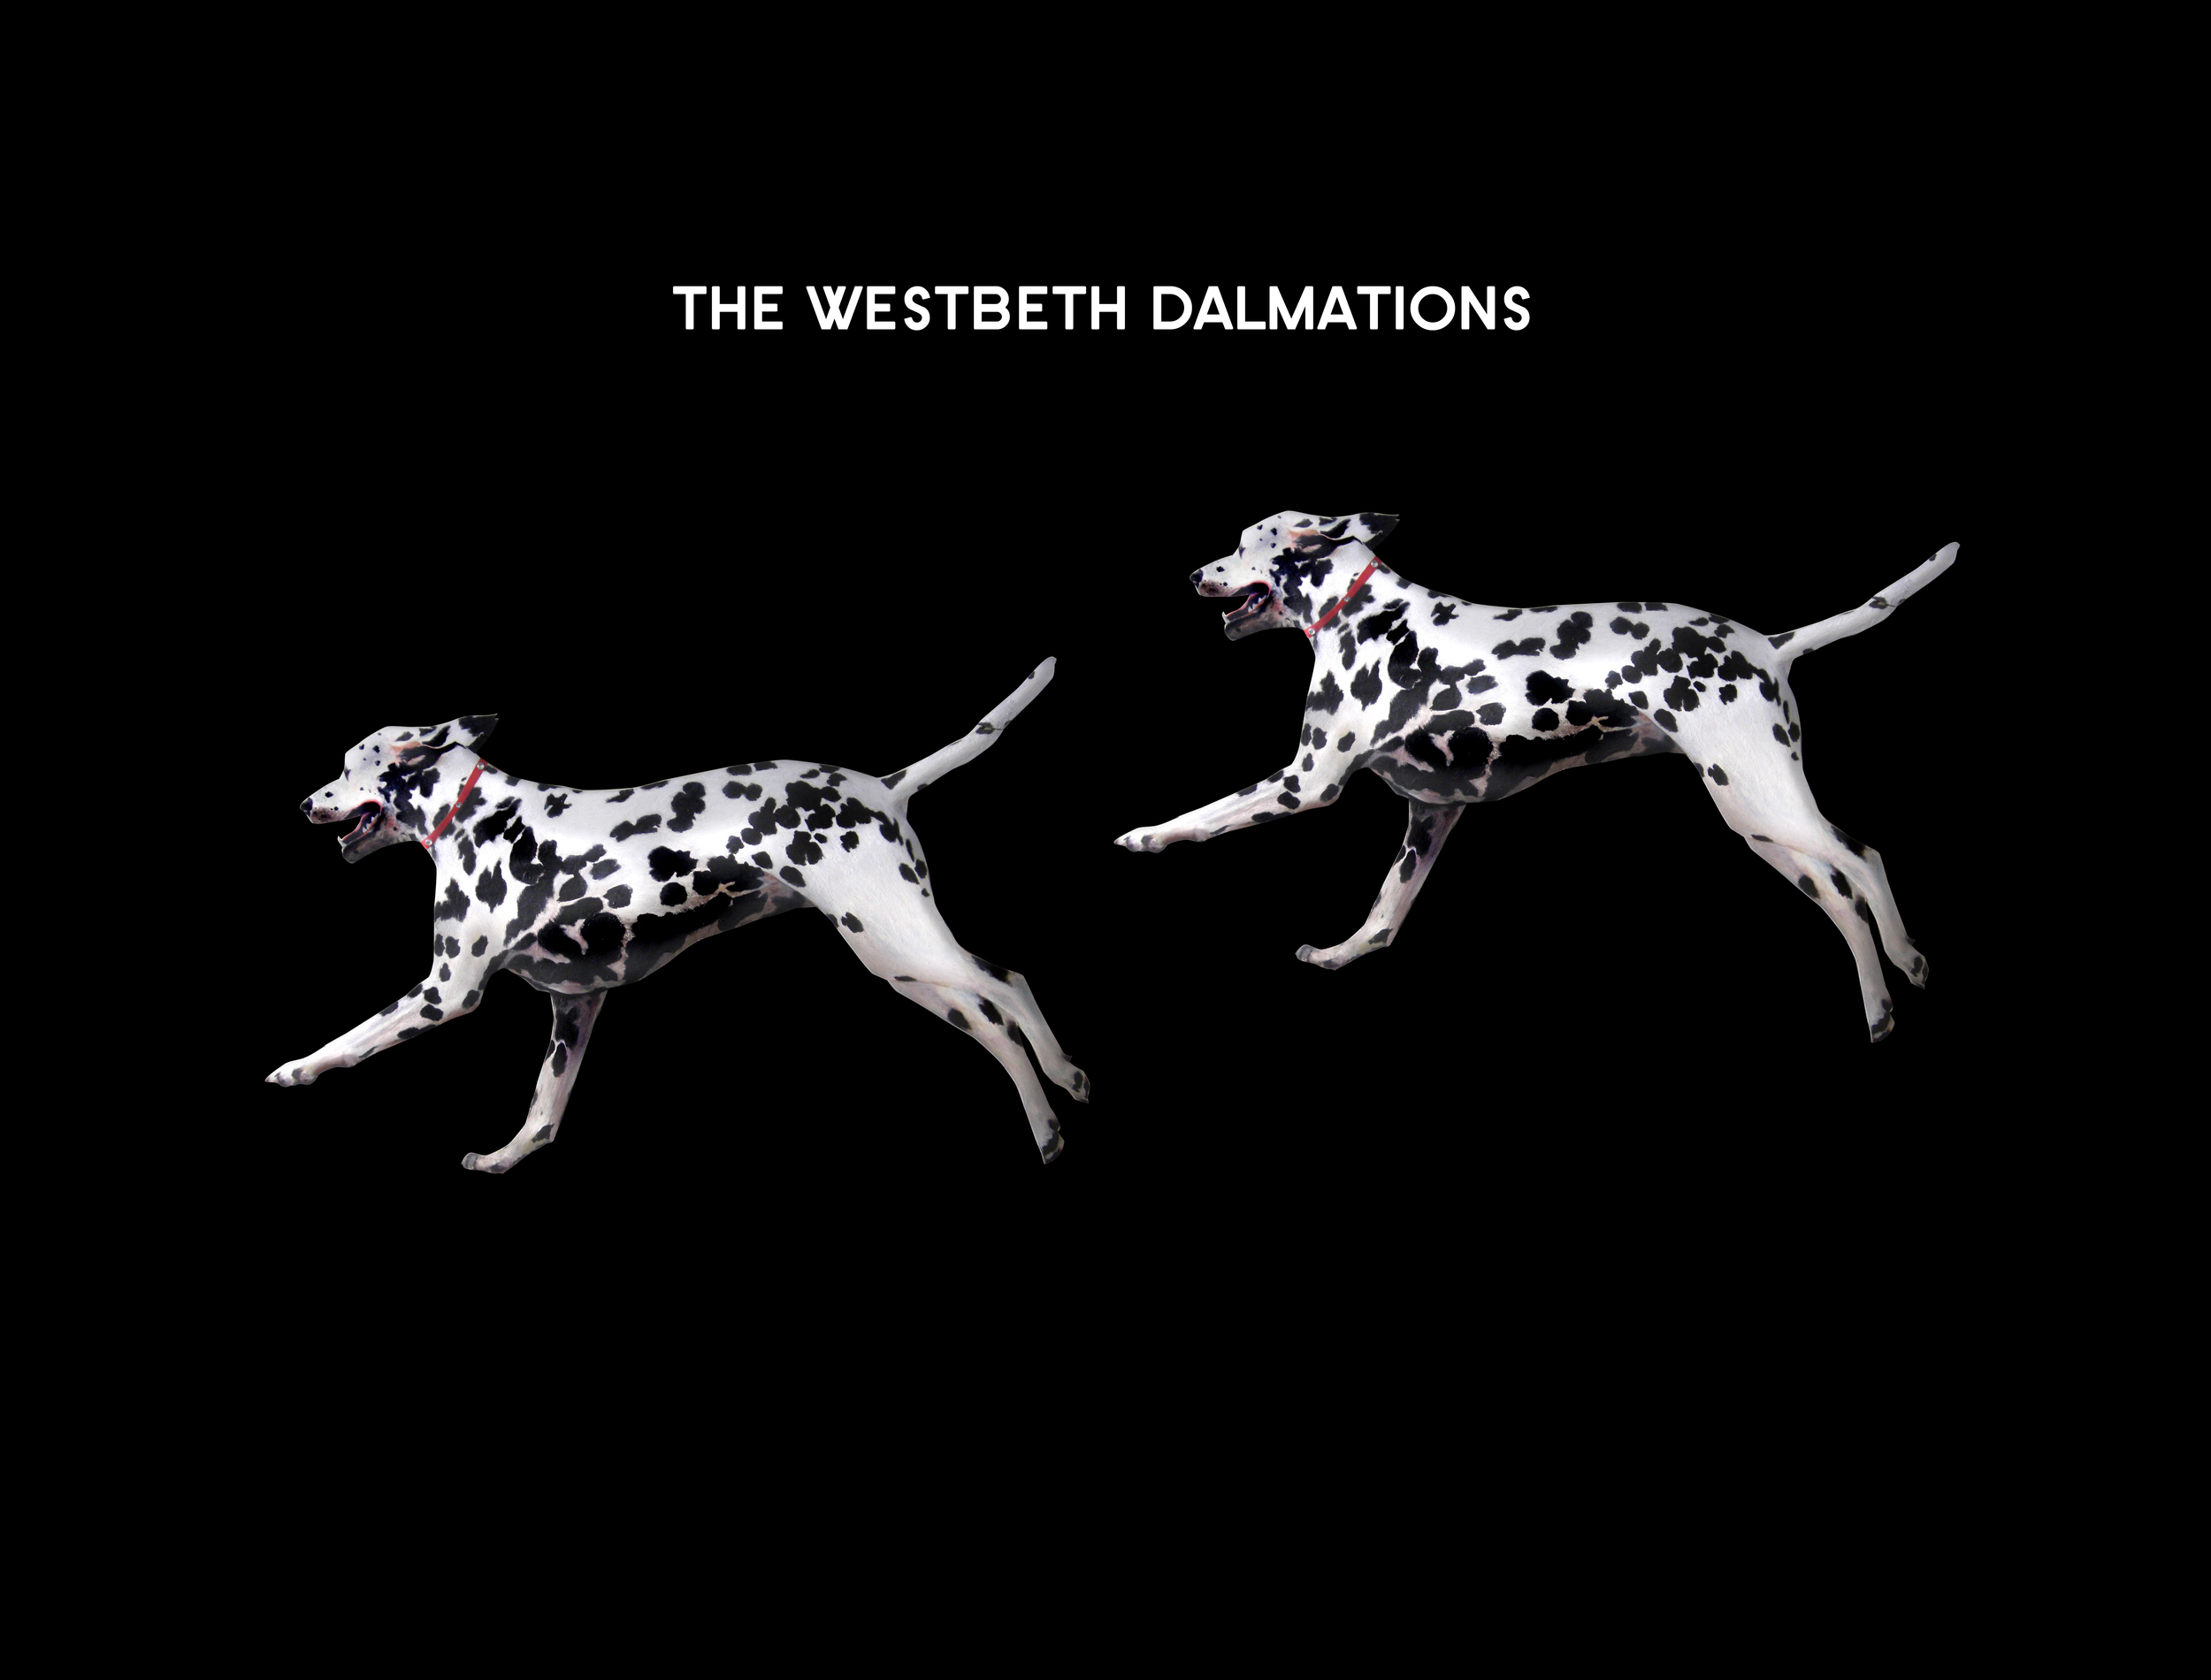 Dalmationblk.jpg